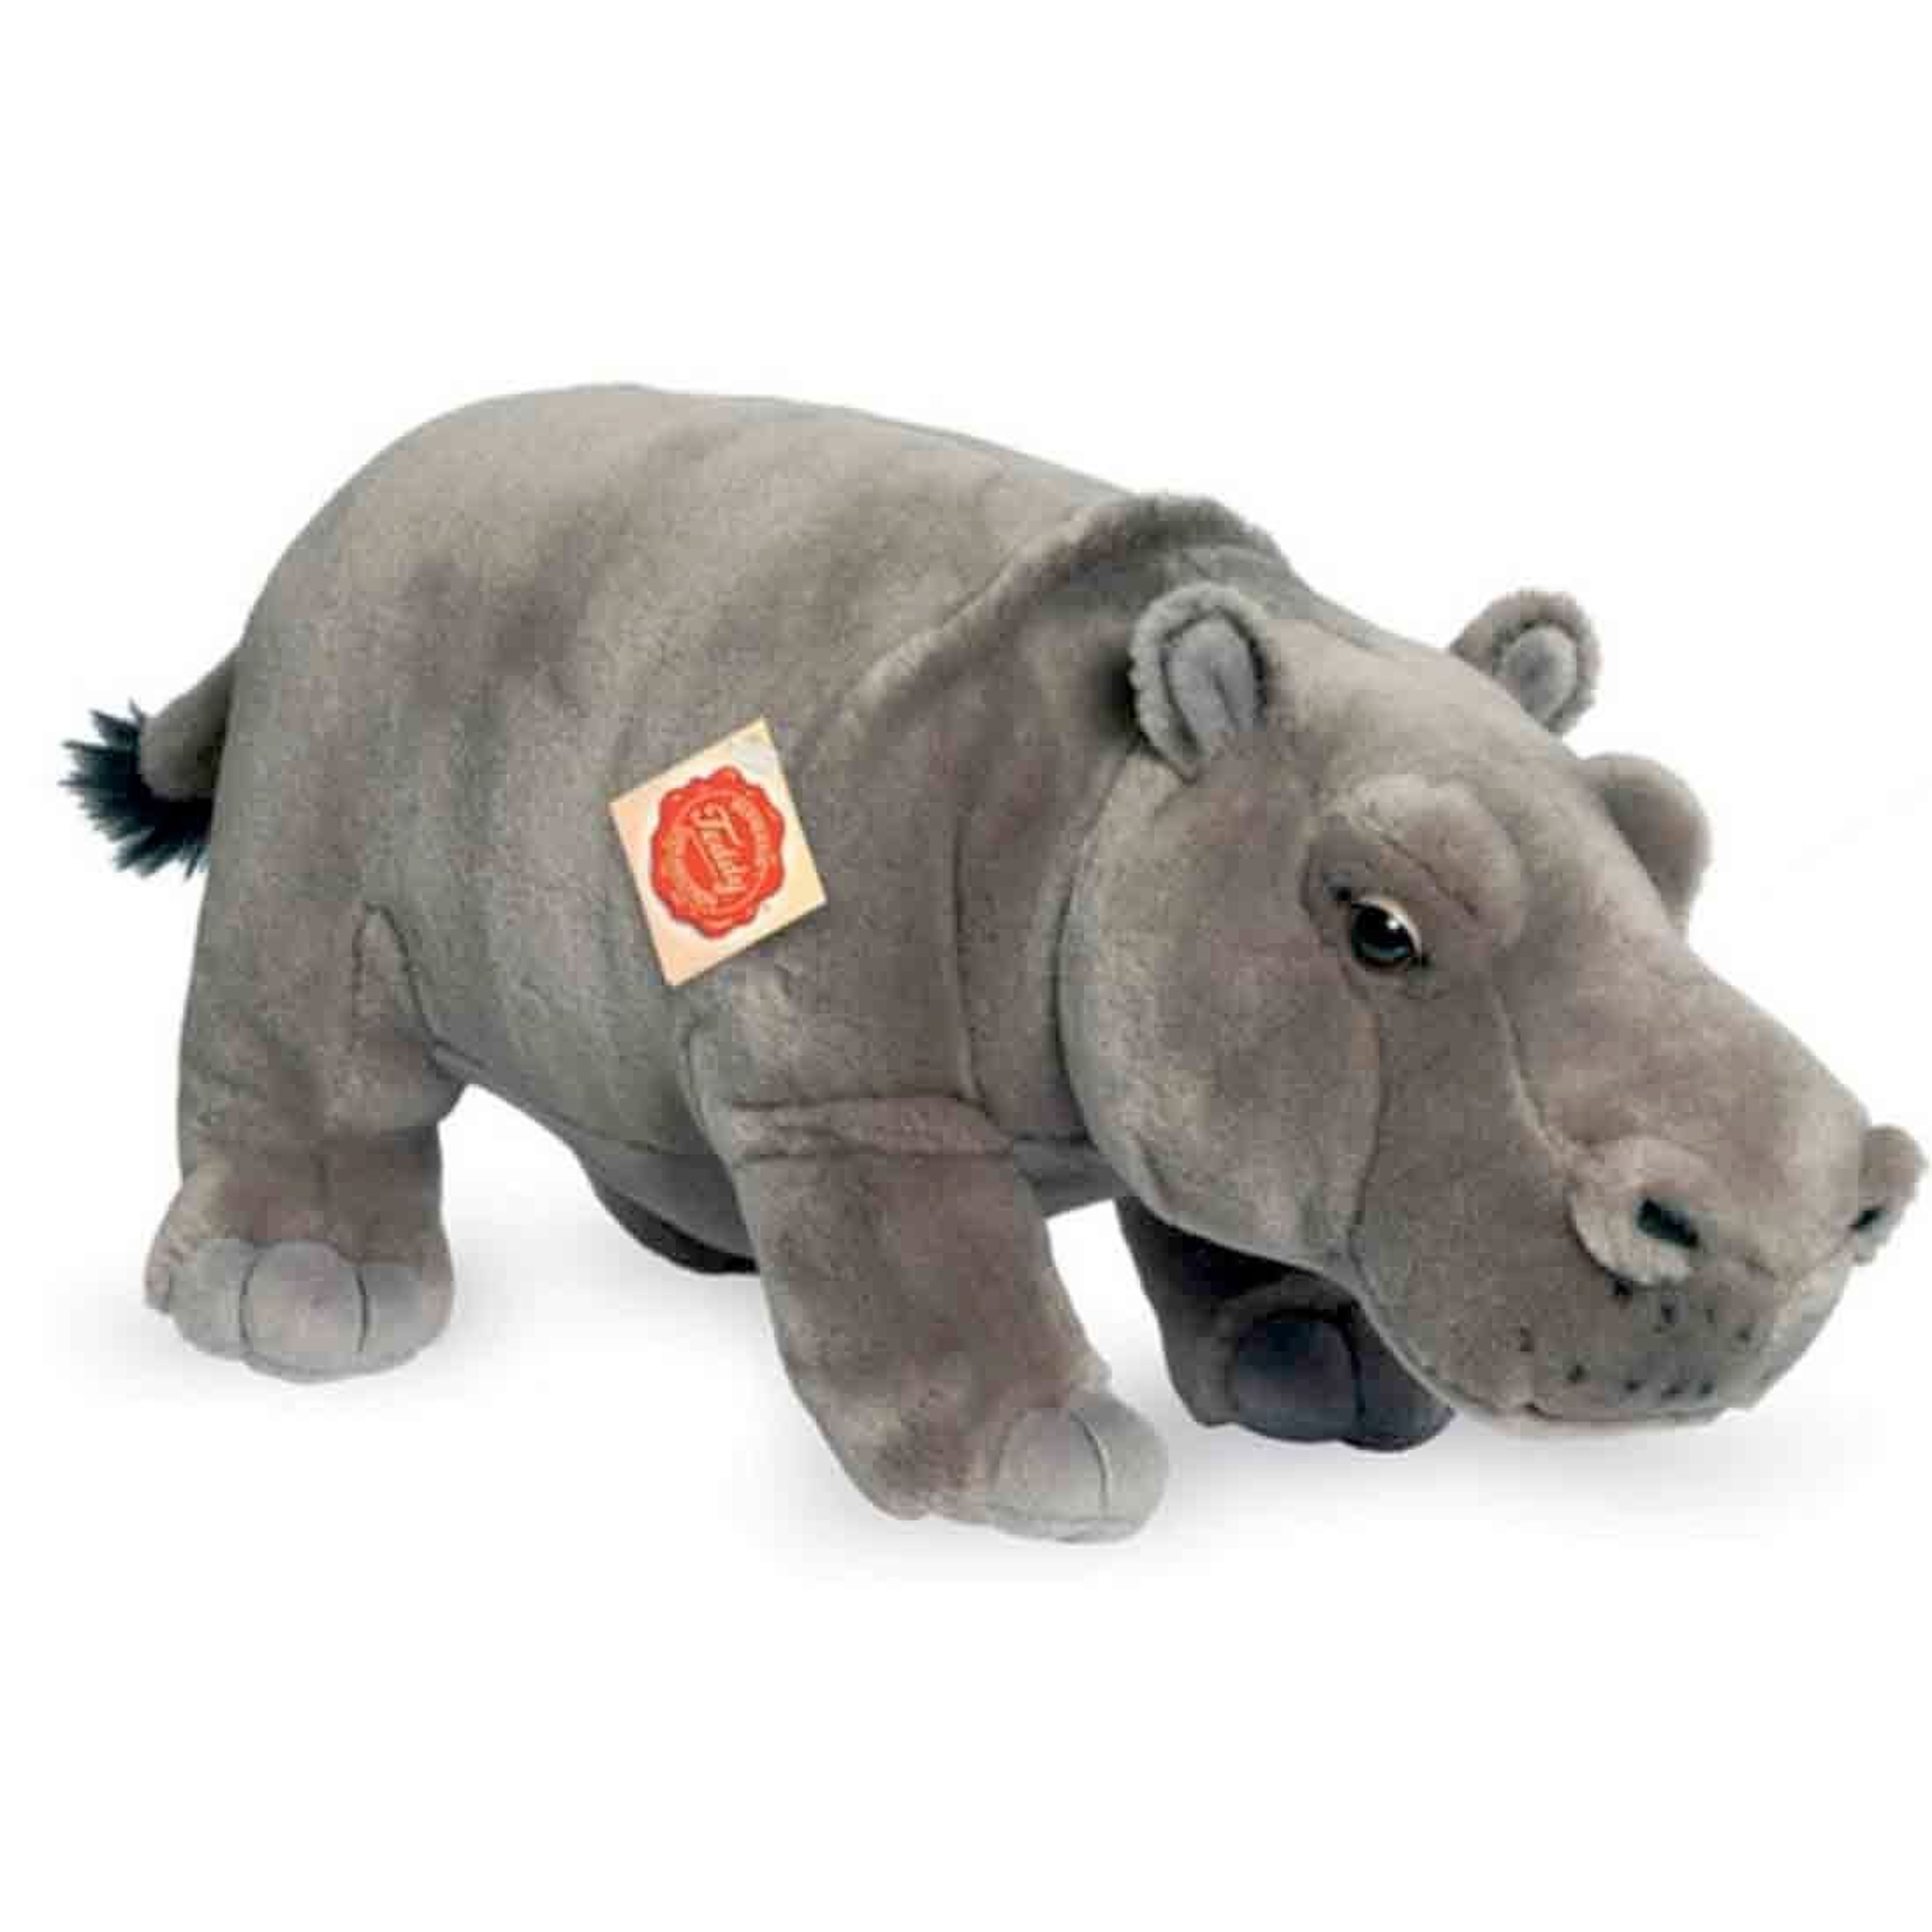 Peluche Hippopotame 30 Cm - Hermann Teddy